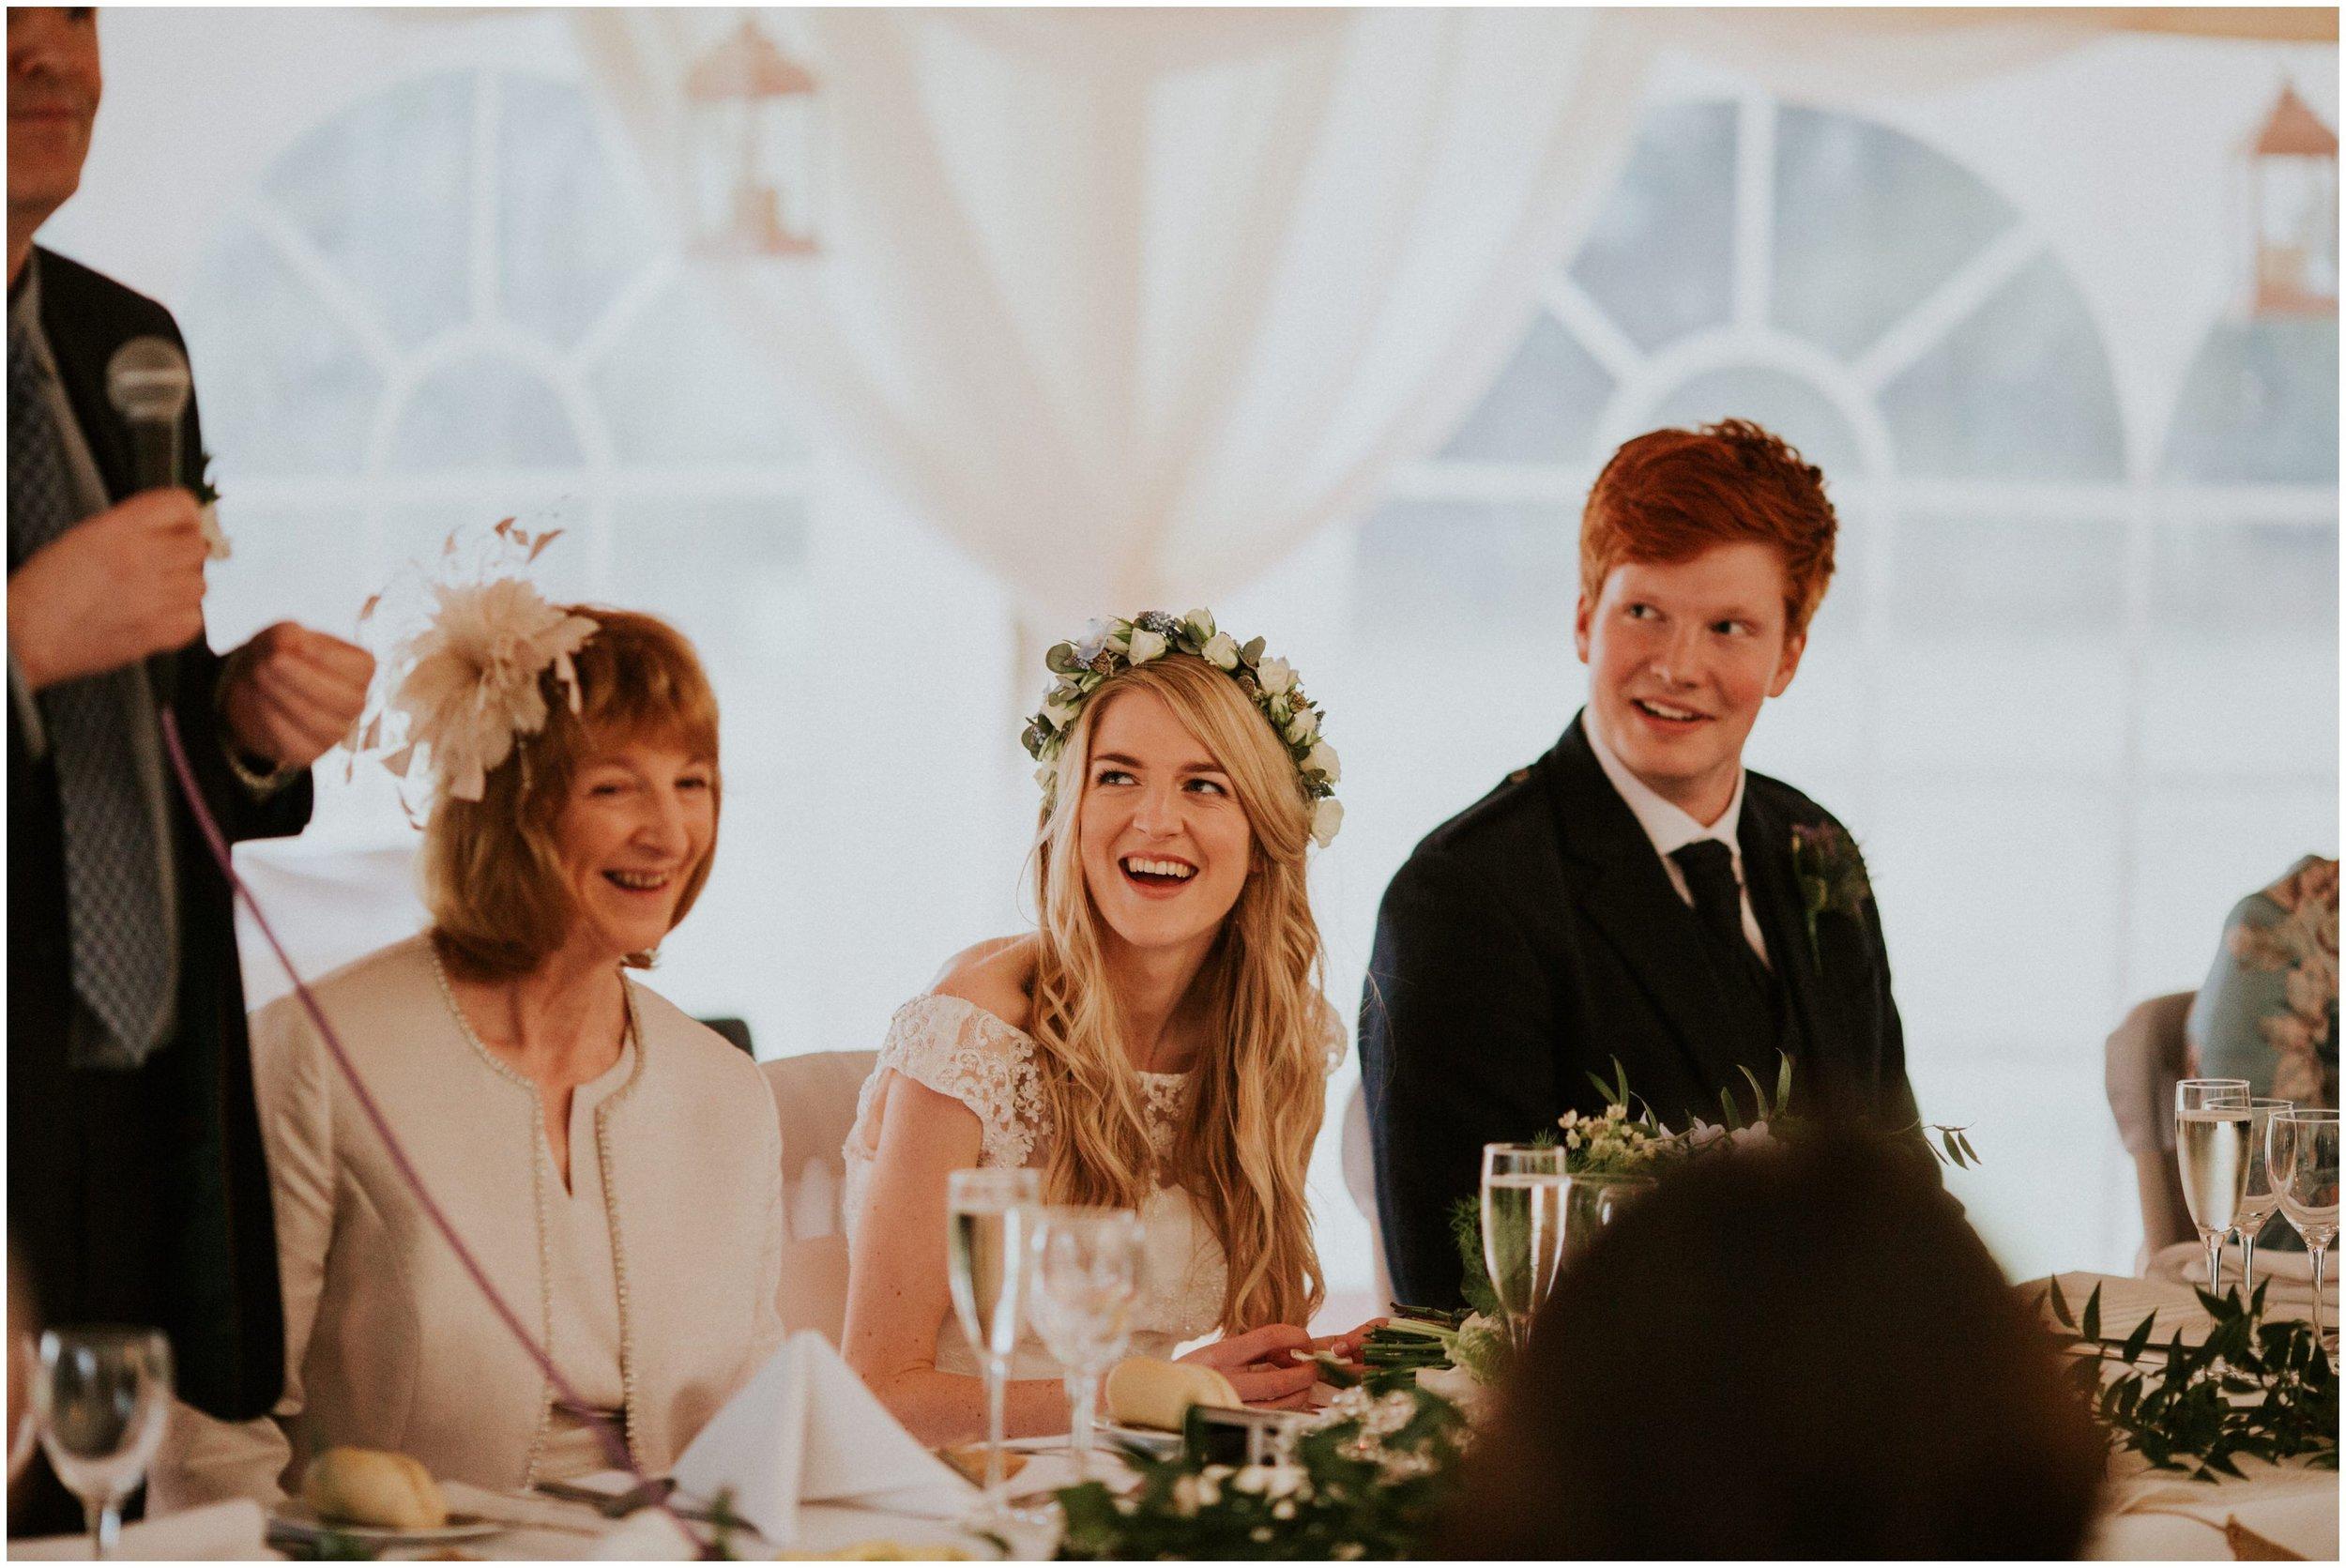 Photography 78 - Glasgow Wedding Photographer - Dave & Alana_0081.jpg